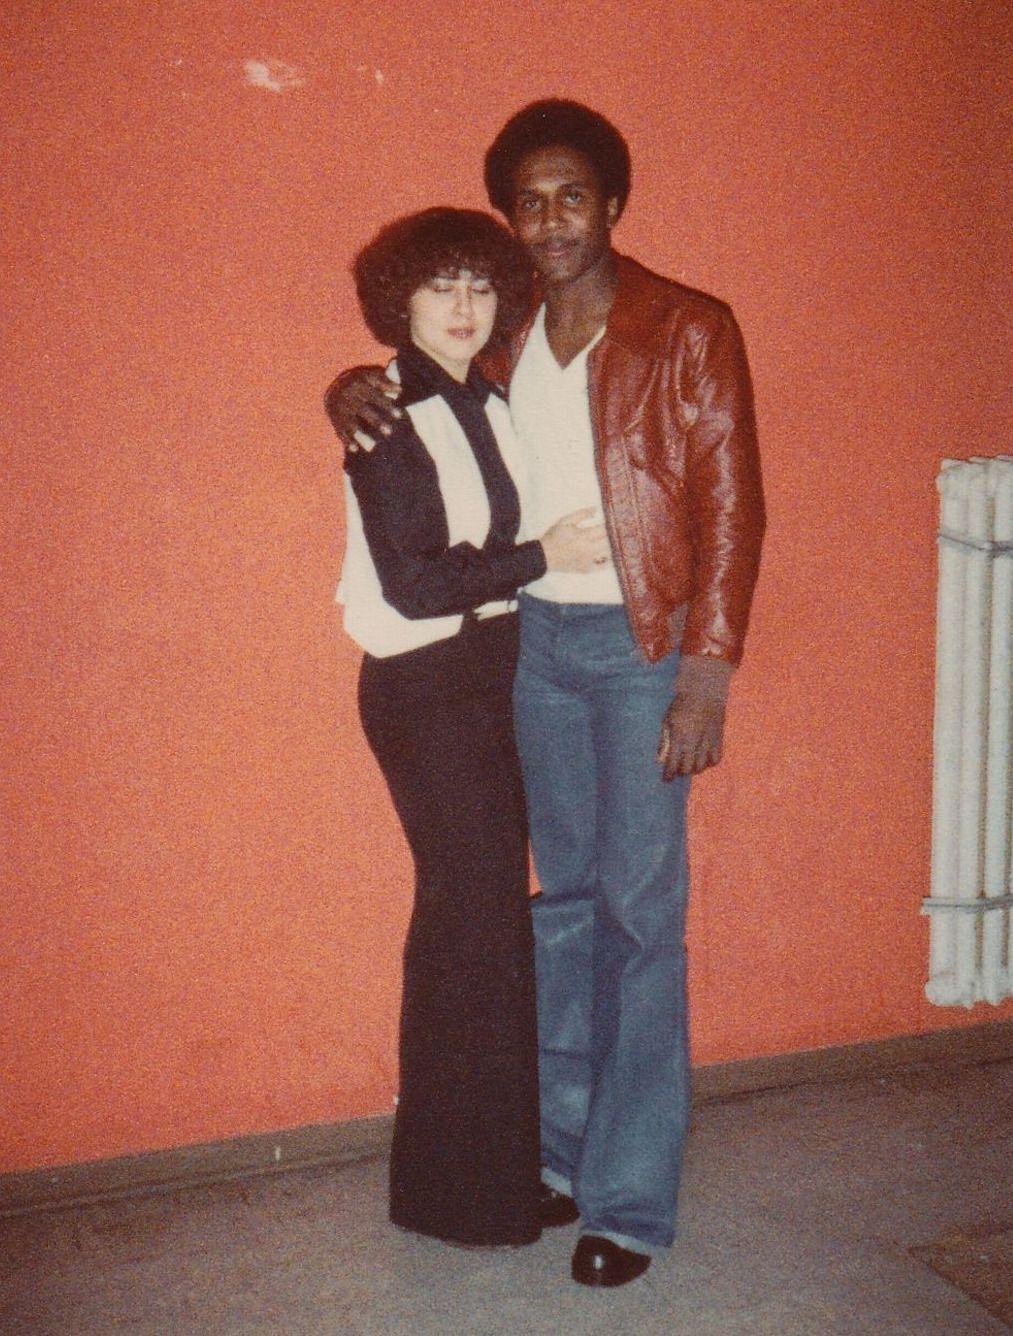 pic 70s interracial